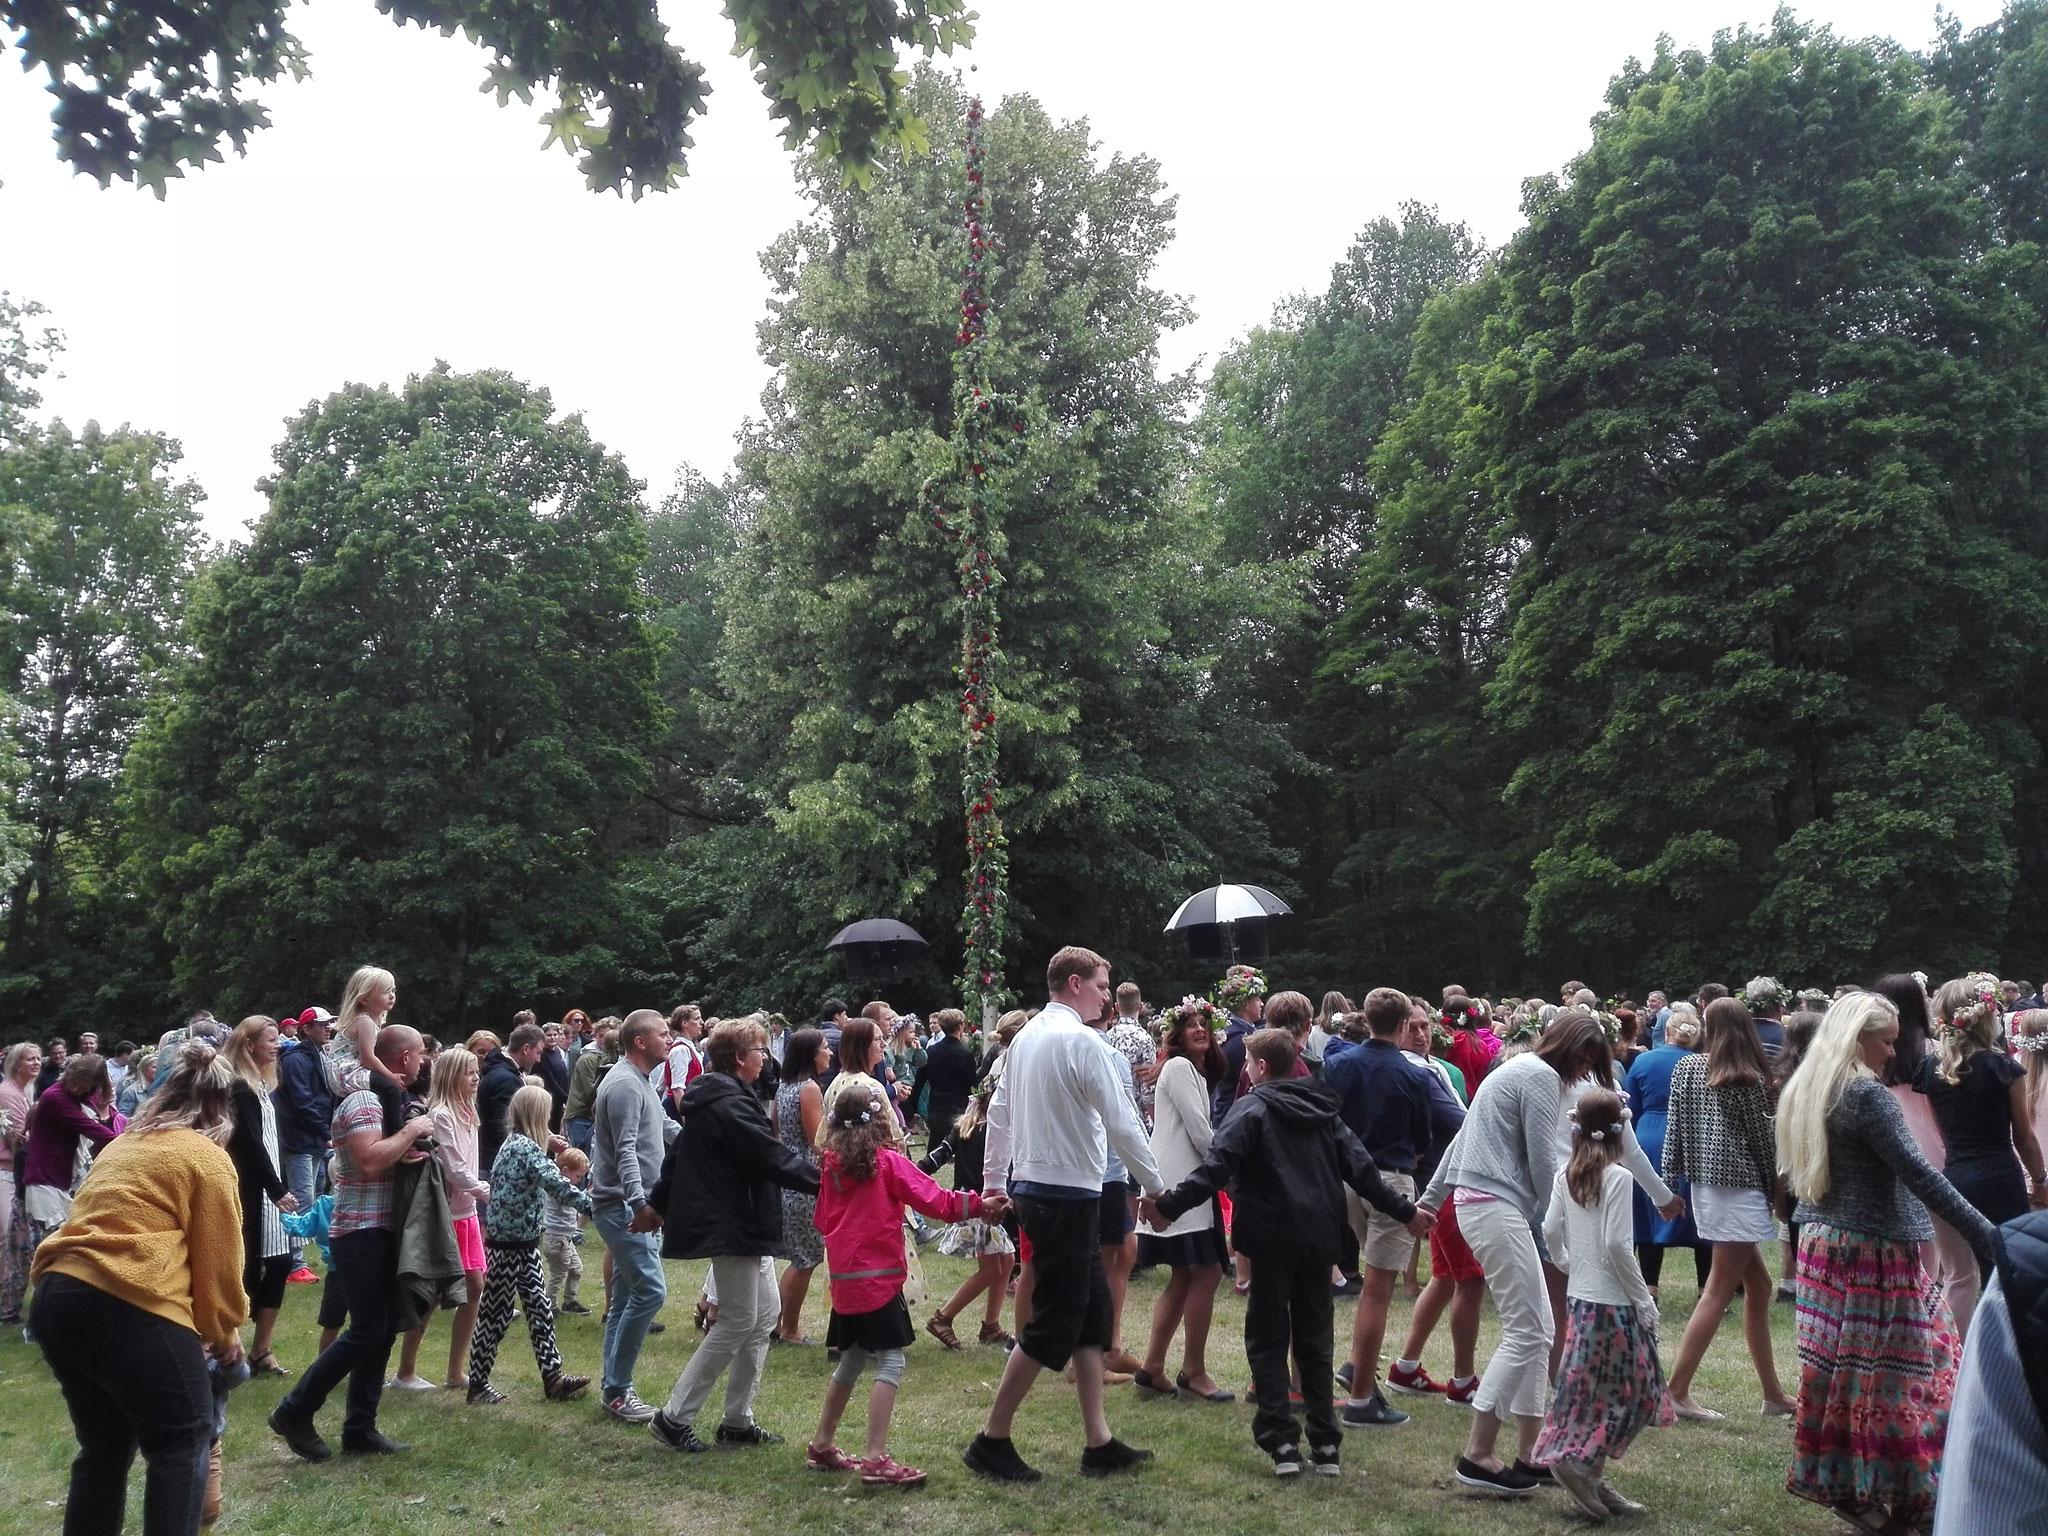 Midsommarfeier in Vadstena